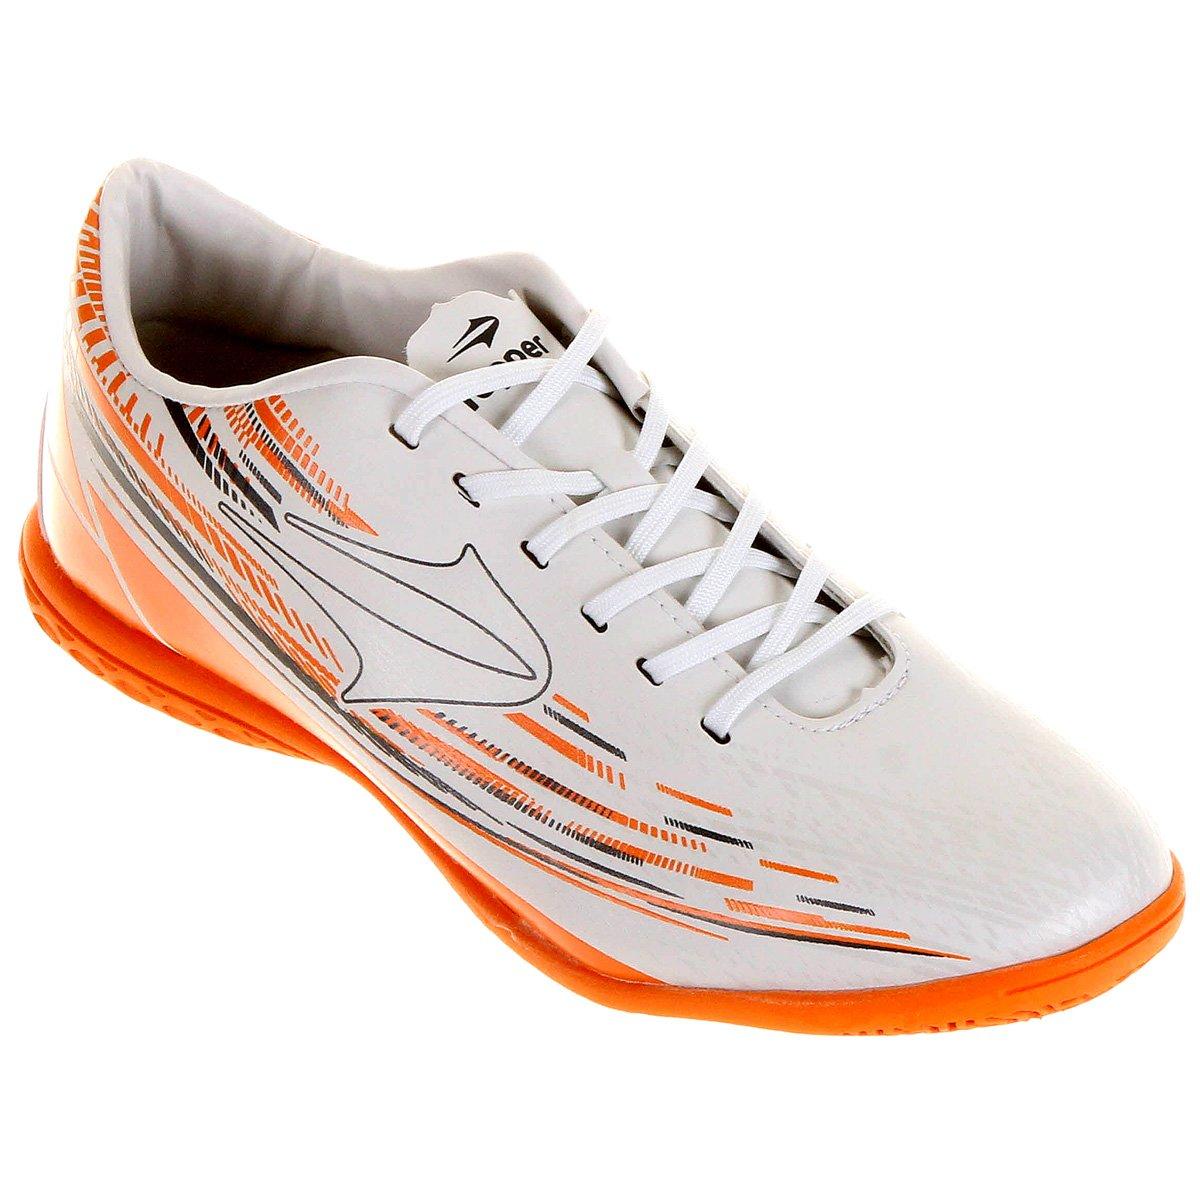 ... Chuteira Futsal Topper Vector Cup Masculina 5f21f7a0905c7